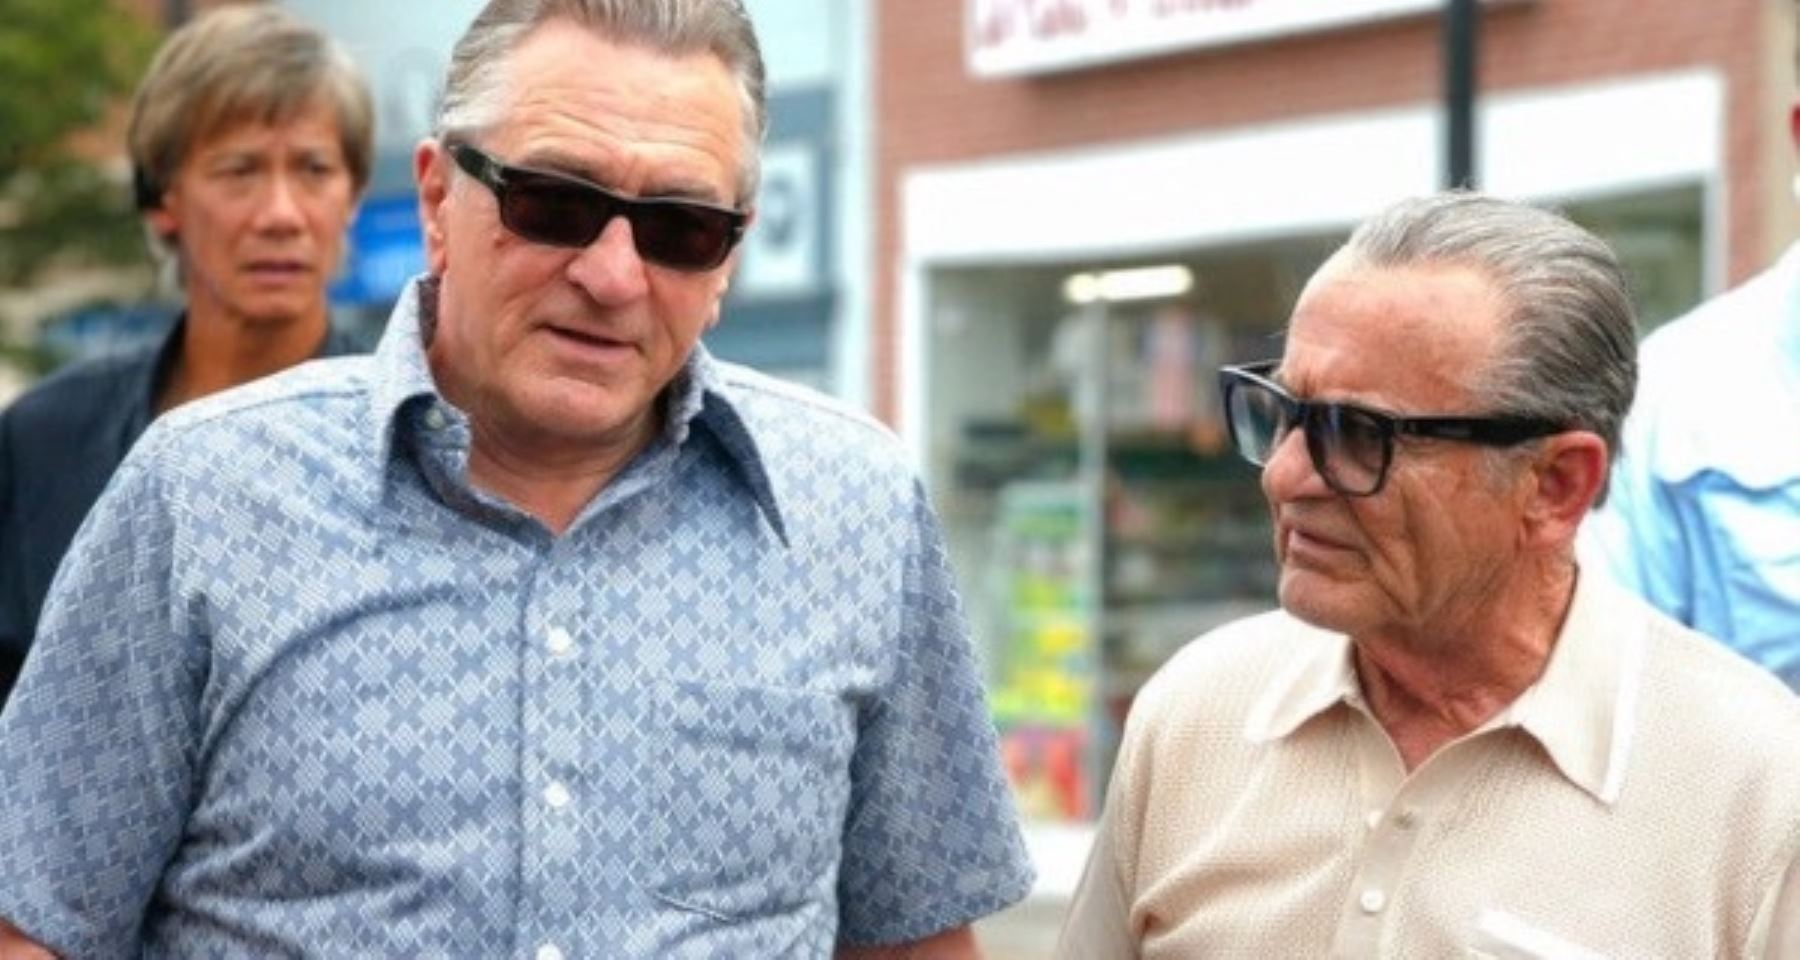 Robert de Niro y Joe Pesci en una escena de The Irishman de Martin Scorsese.